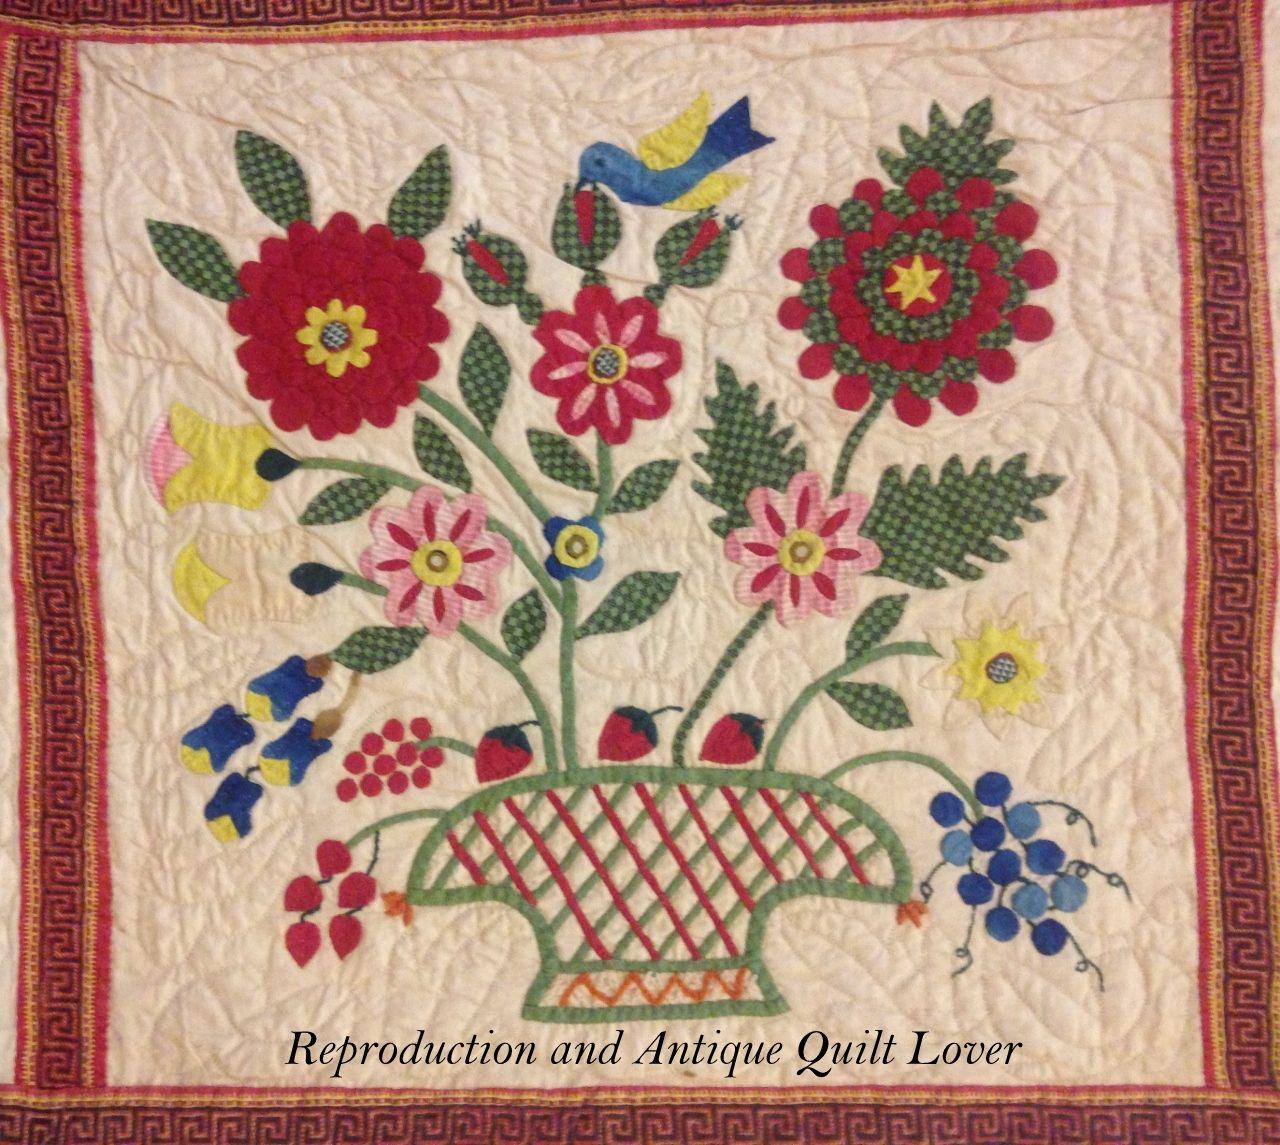 Repro Quilt Lover | Applique | Pinterest | Quilt : repro quilt lover - Adamdwight.com